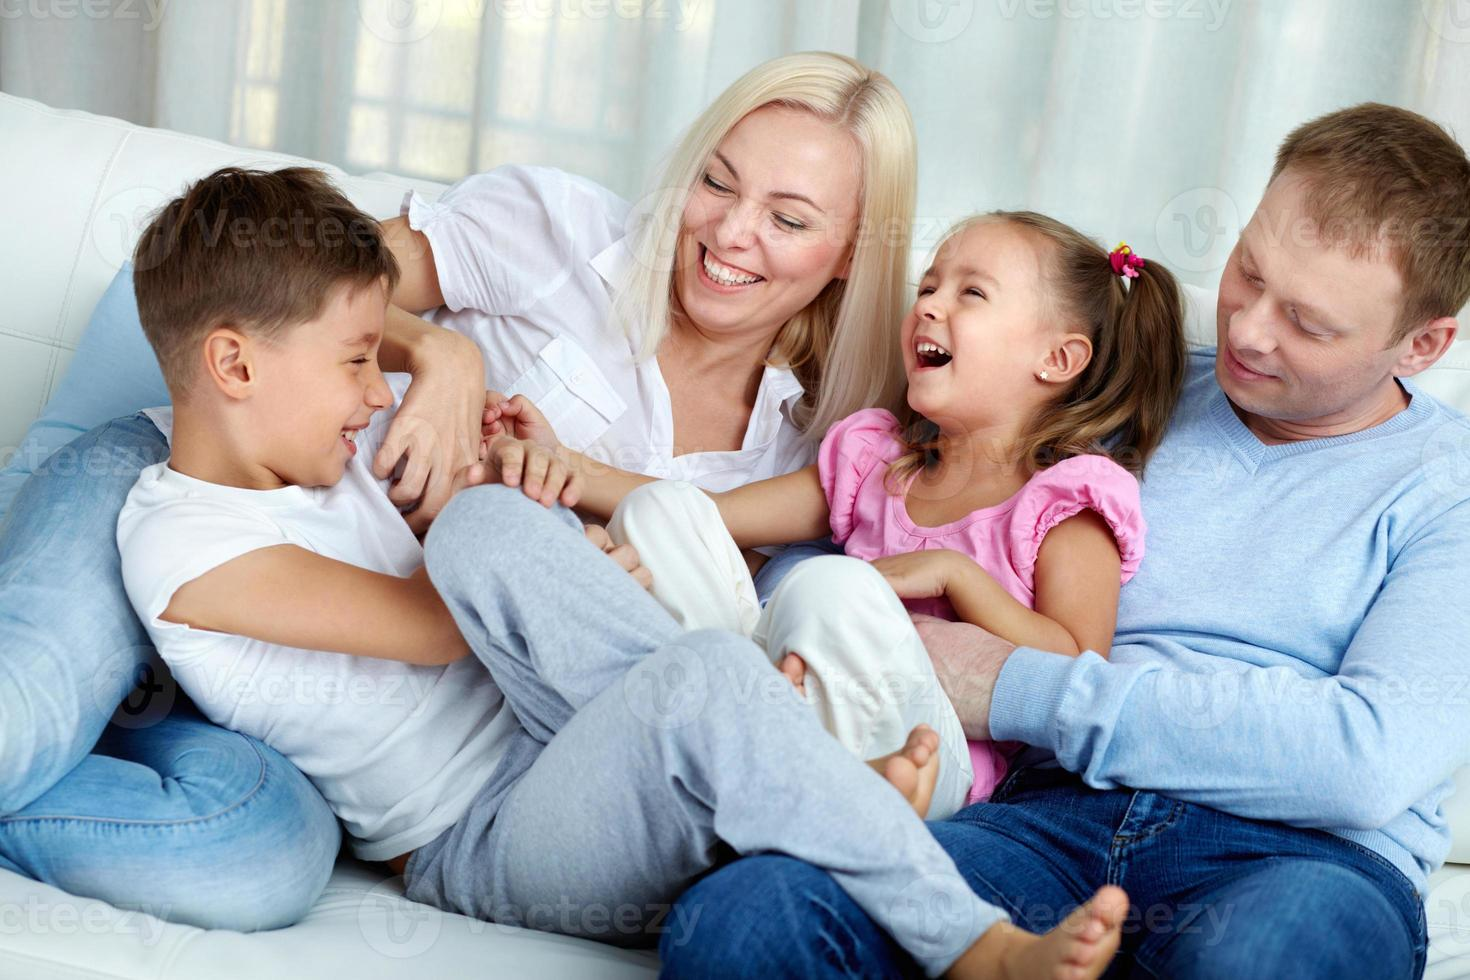 Playful family photo